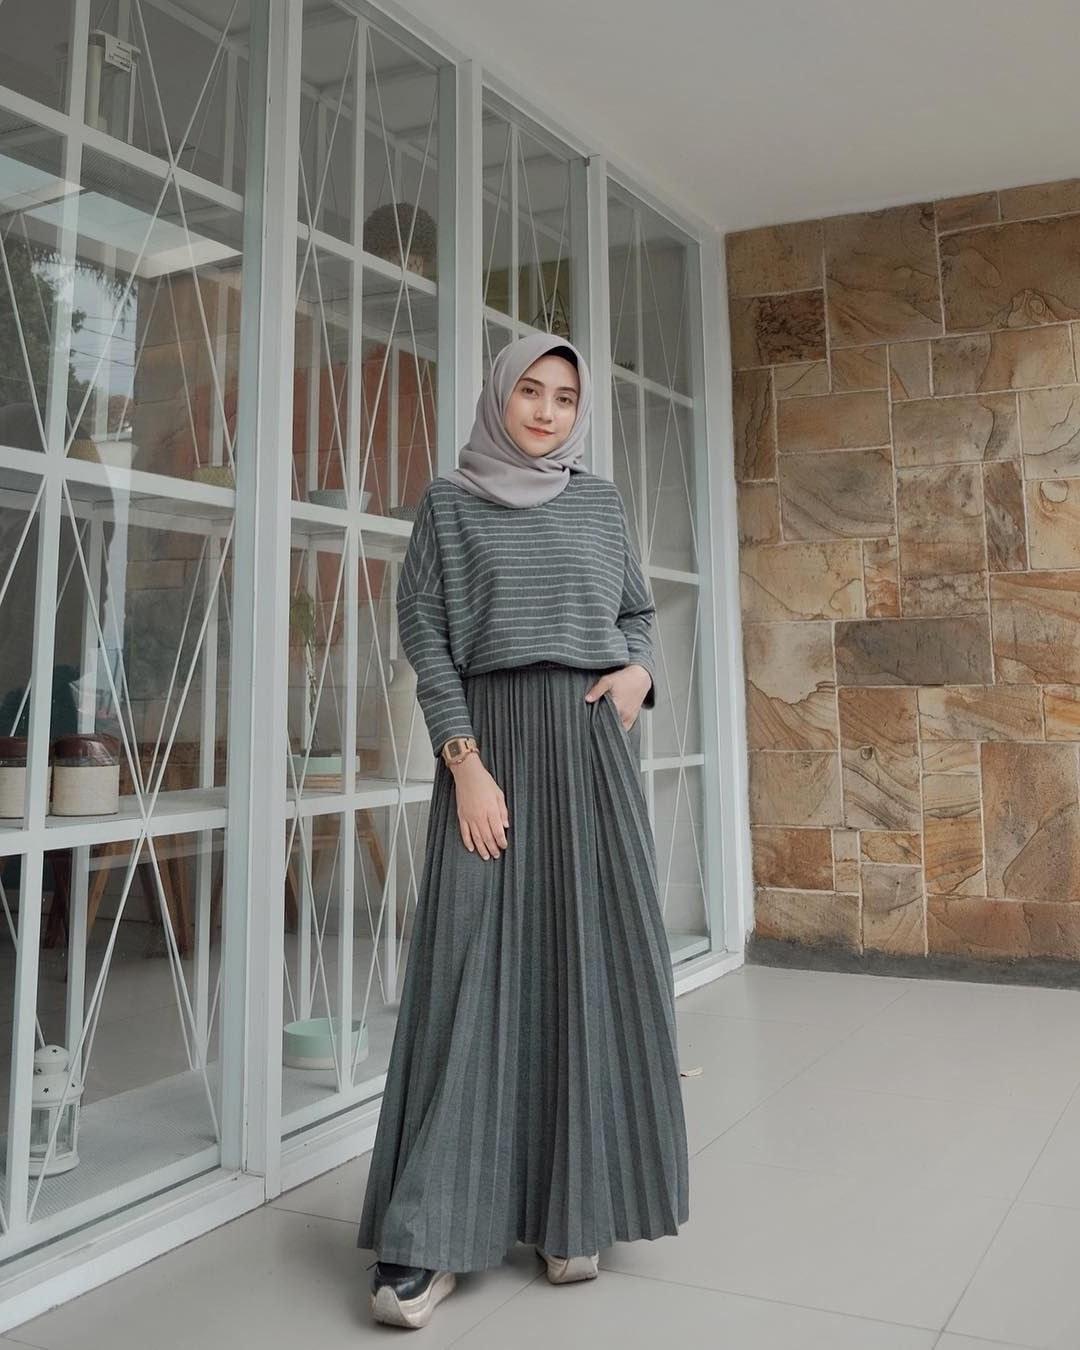 Model Fashion Baju Lebaran 2019 Etdg Baju Muslim Lebaran Terbaru 2019 Dengan Gambar